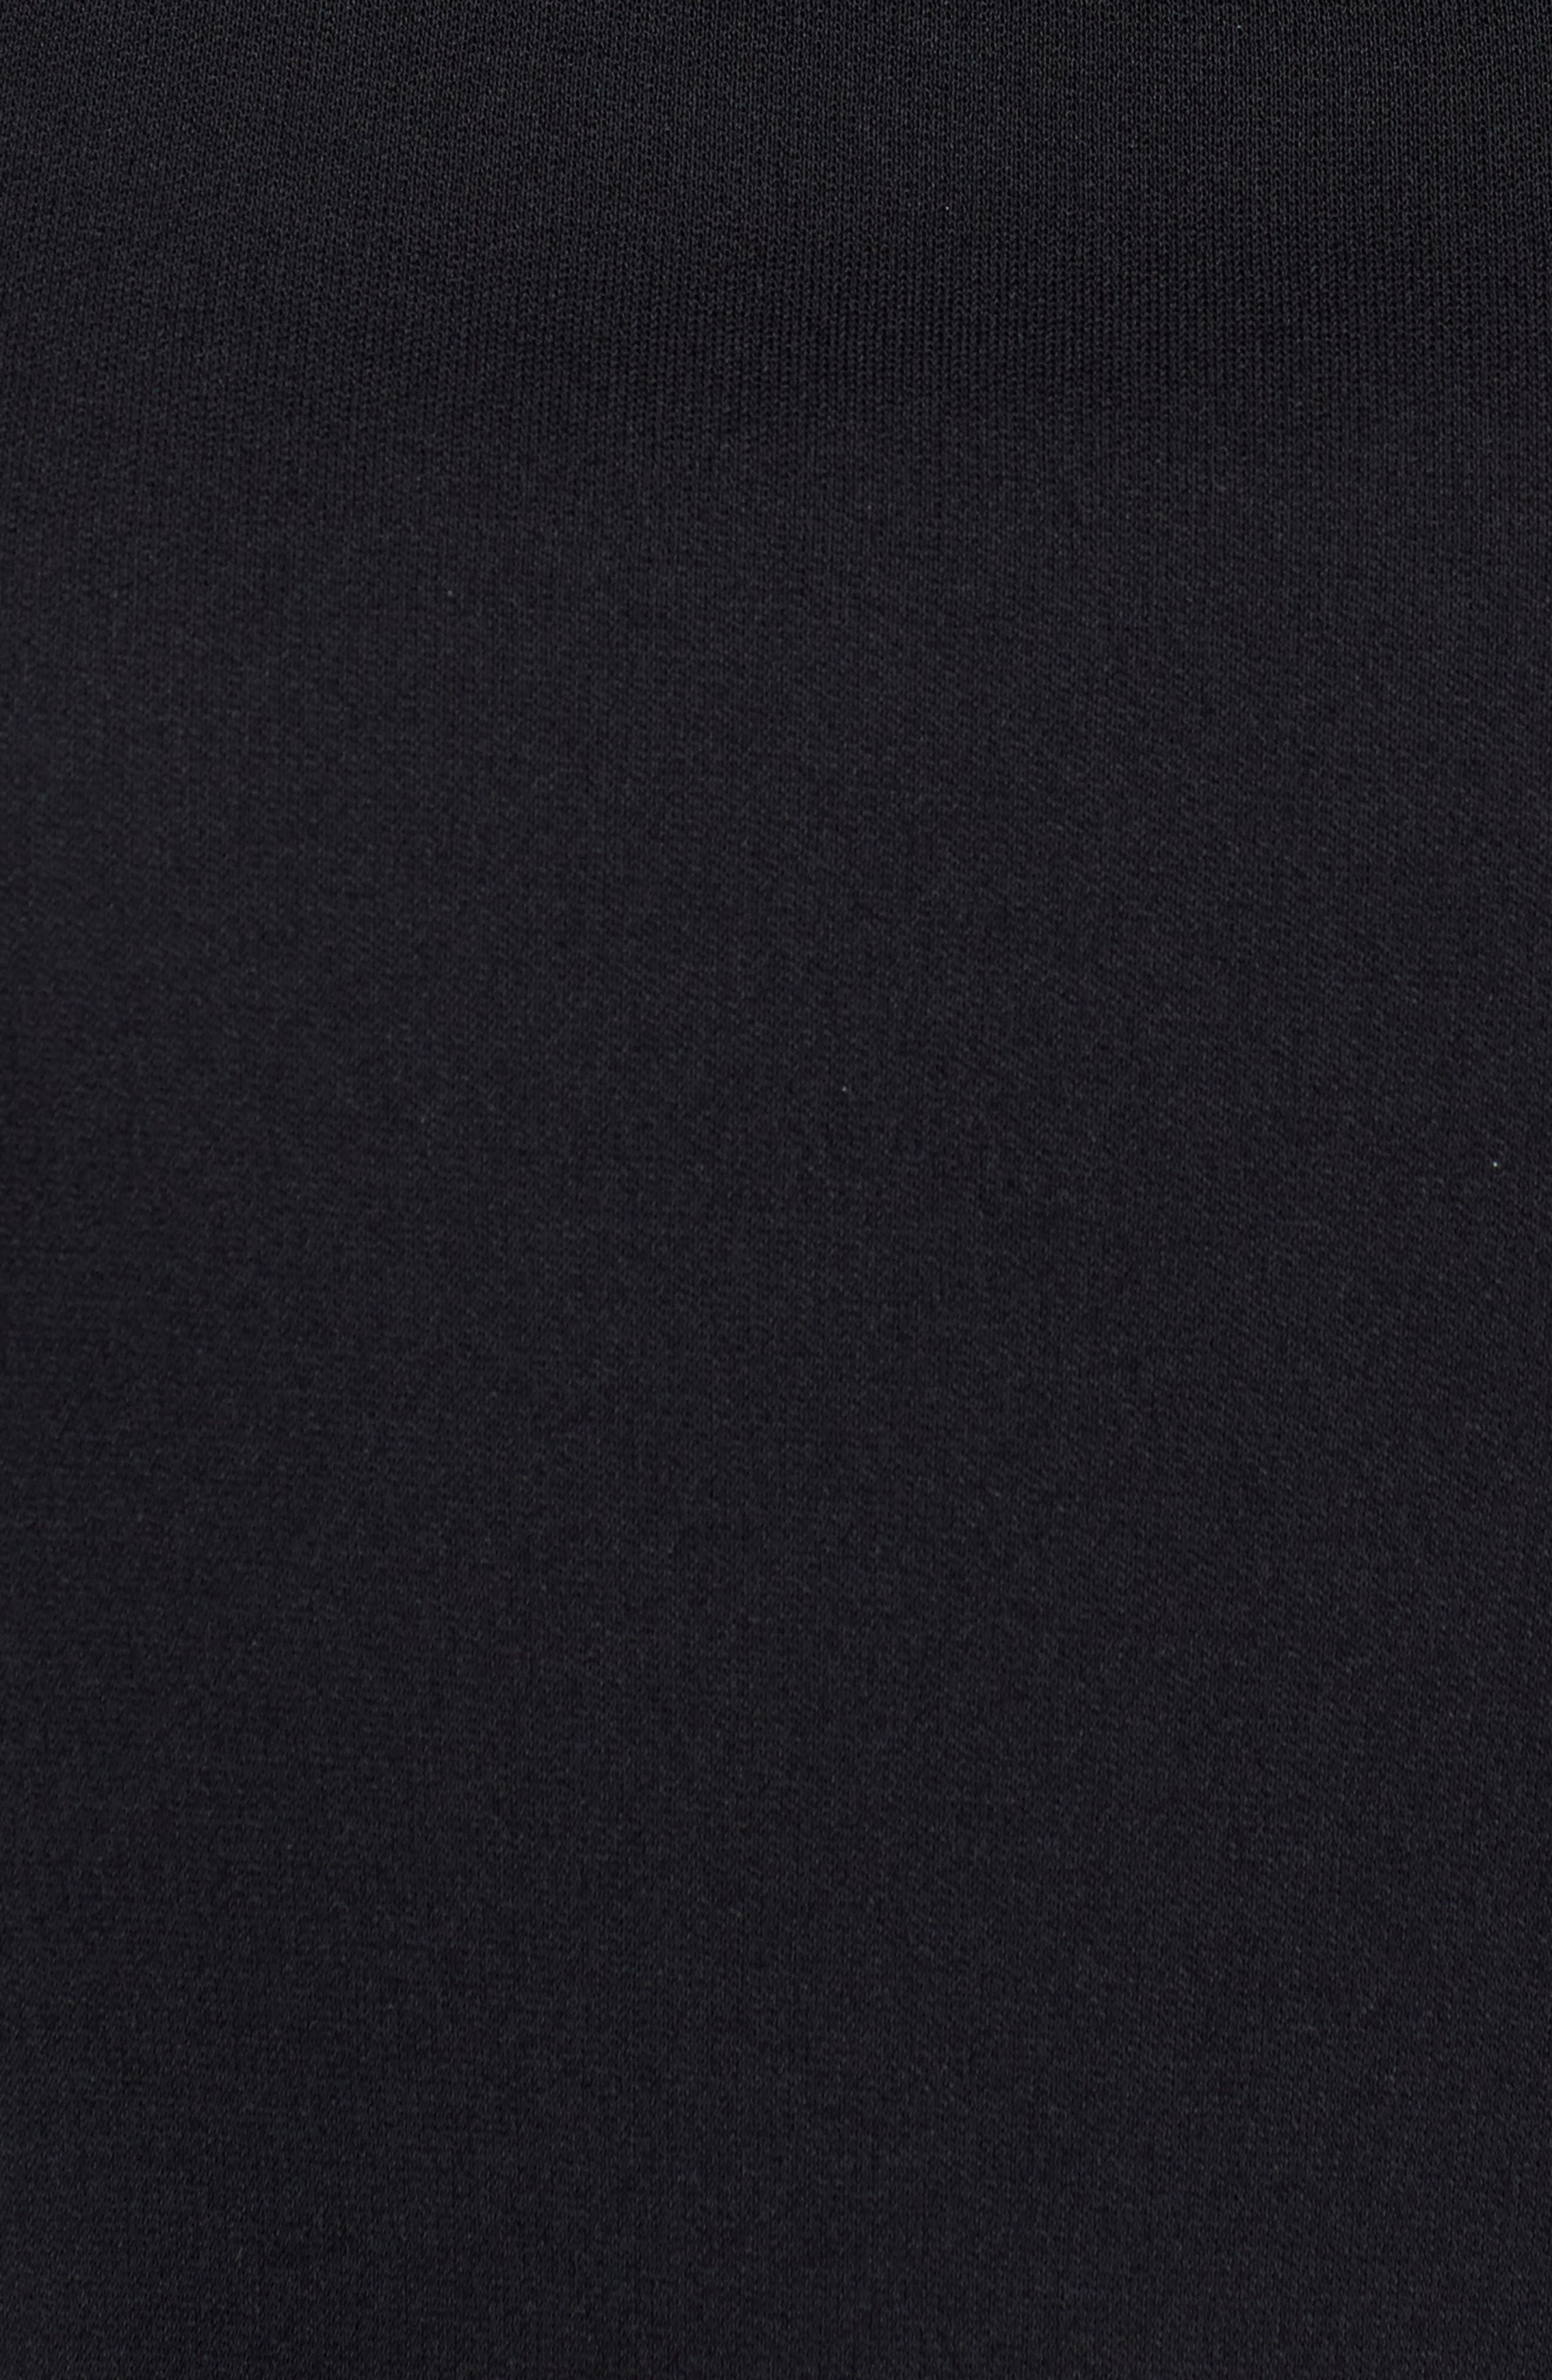 Sheer Yoke Shift Dress,                             Alternate thumbnail 5, color,                             RICH BLACK